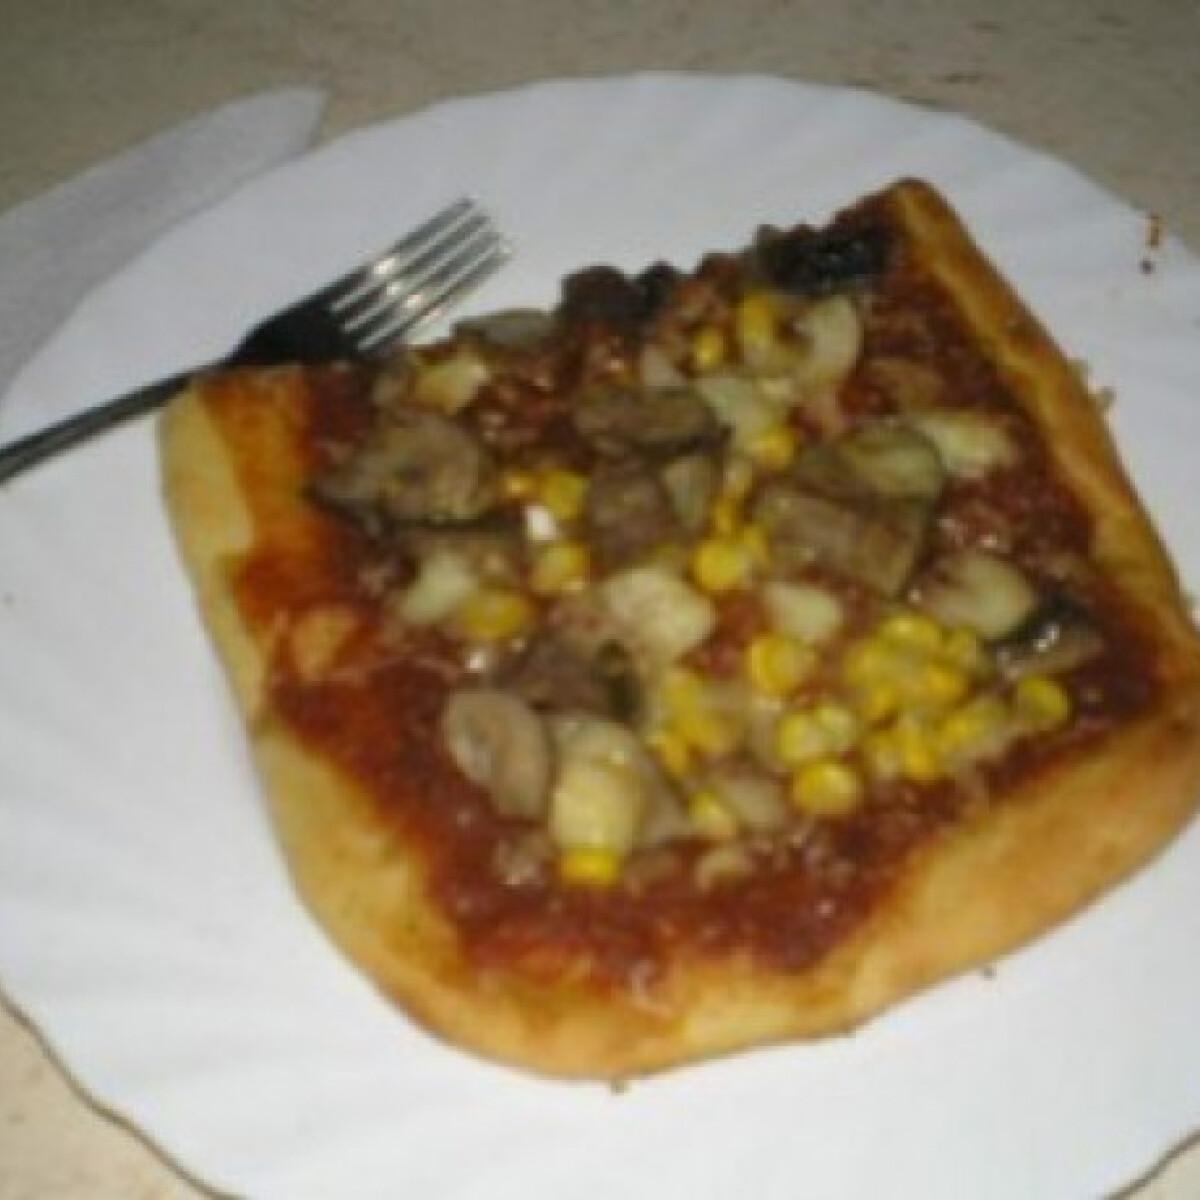 Ezen a képen: Pizza 22. - húsmentes